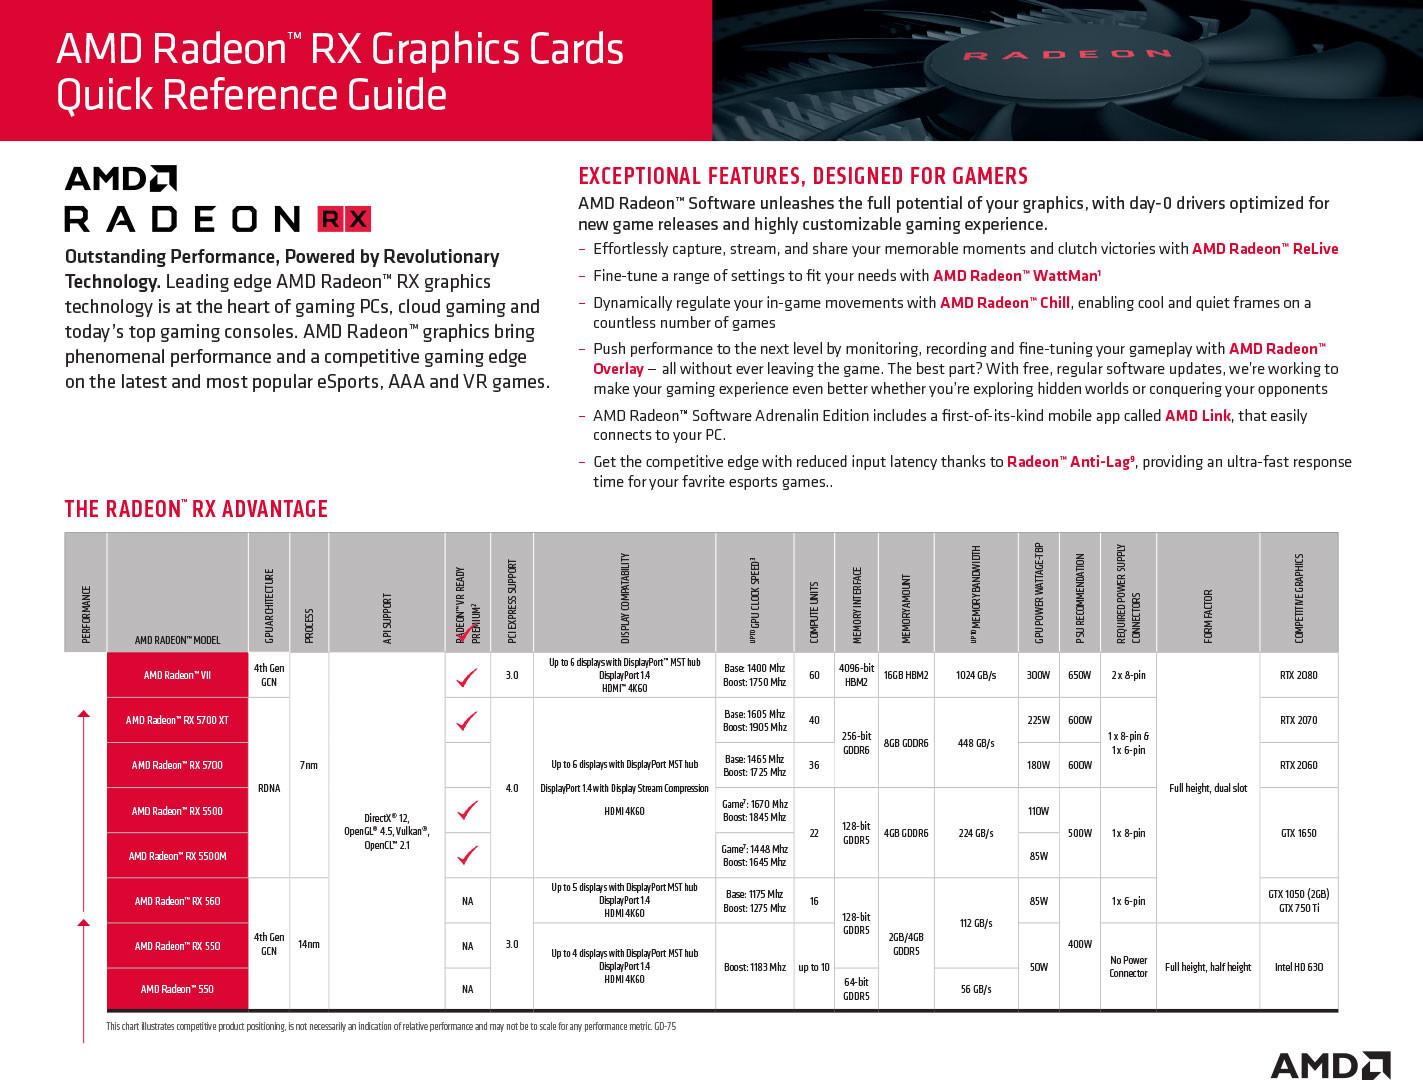 Radeon RX 5500 گرافیک GTX 1650 را خورد میکند